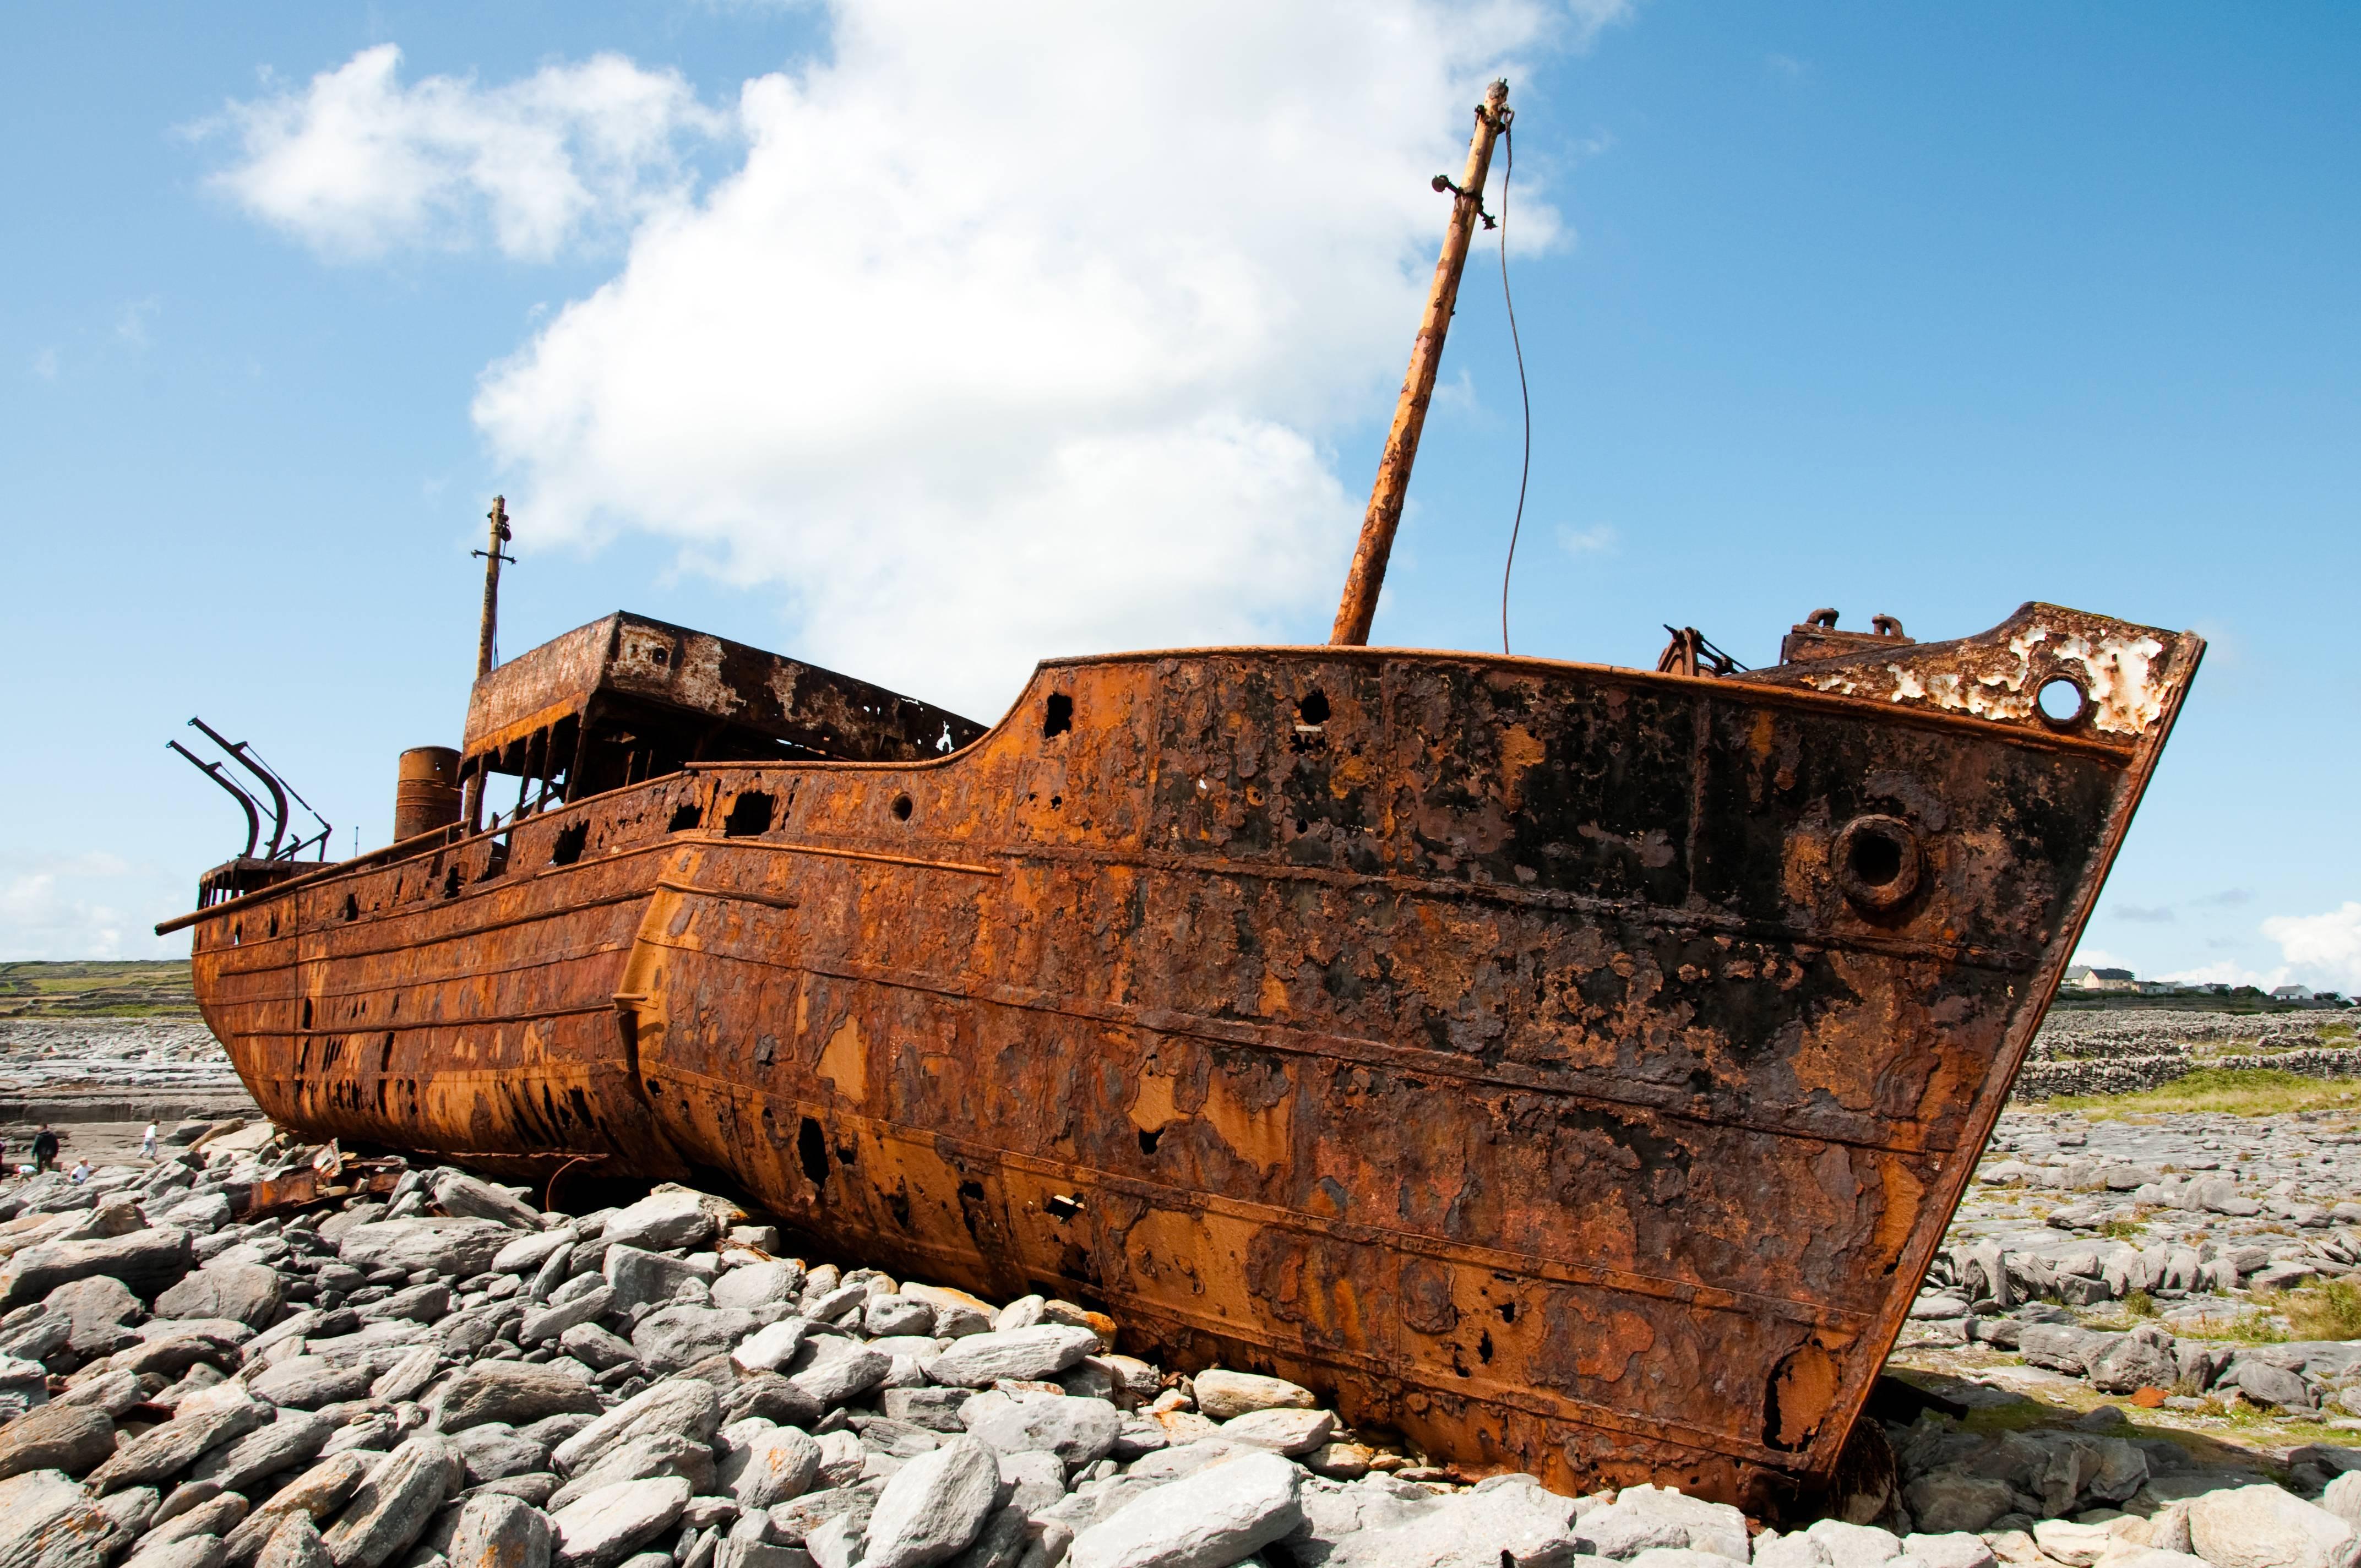 Rusty Ship Wallpaper - Imgur